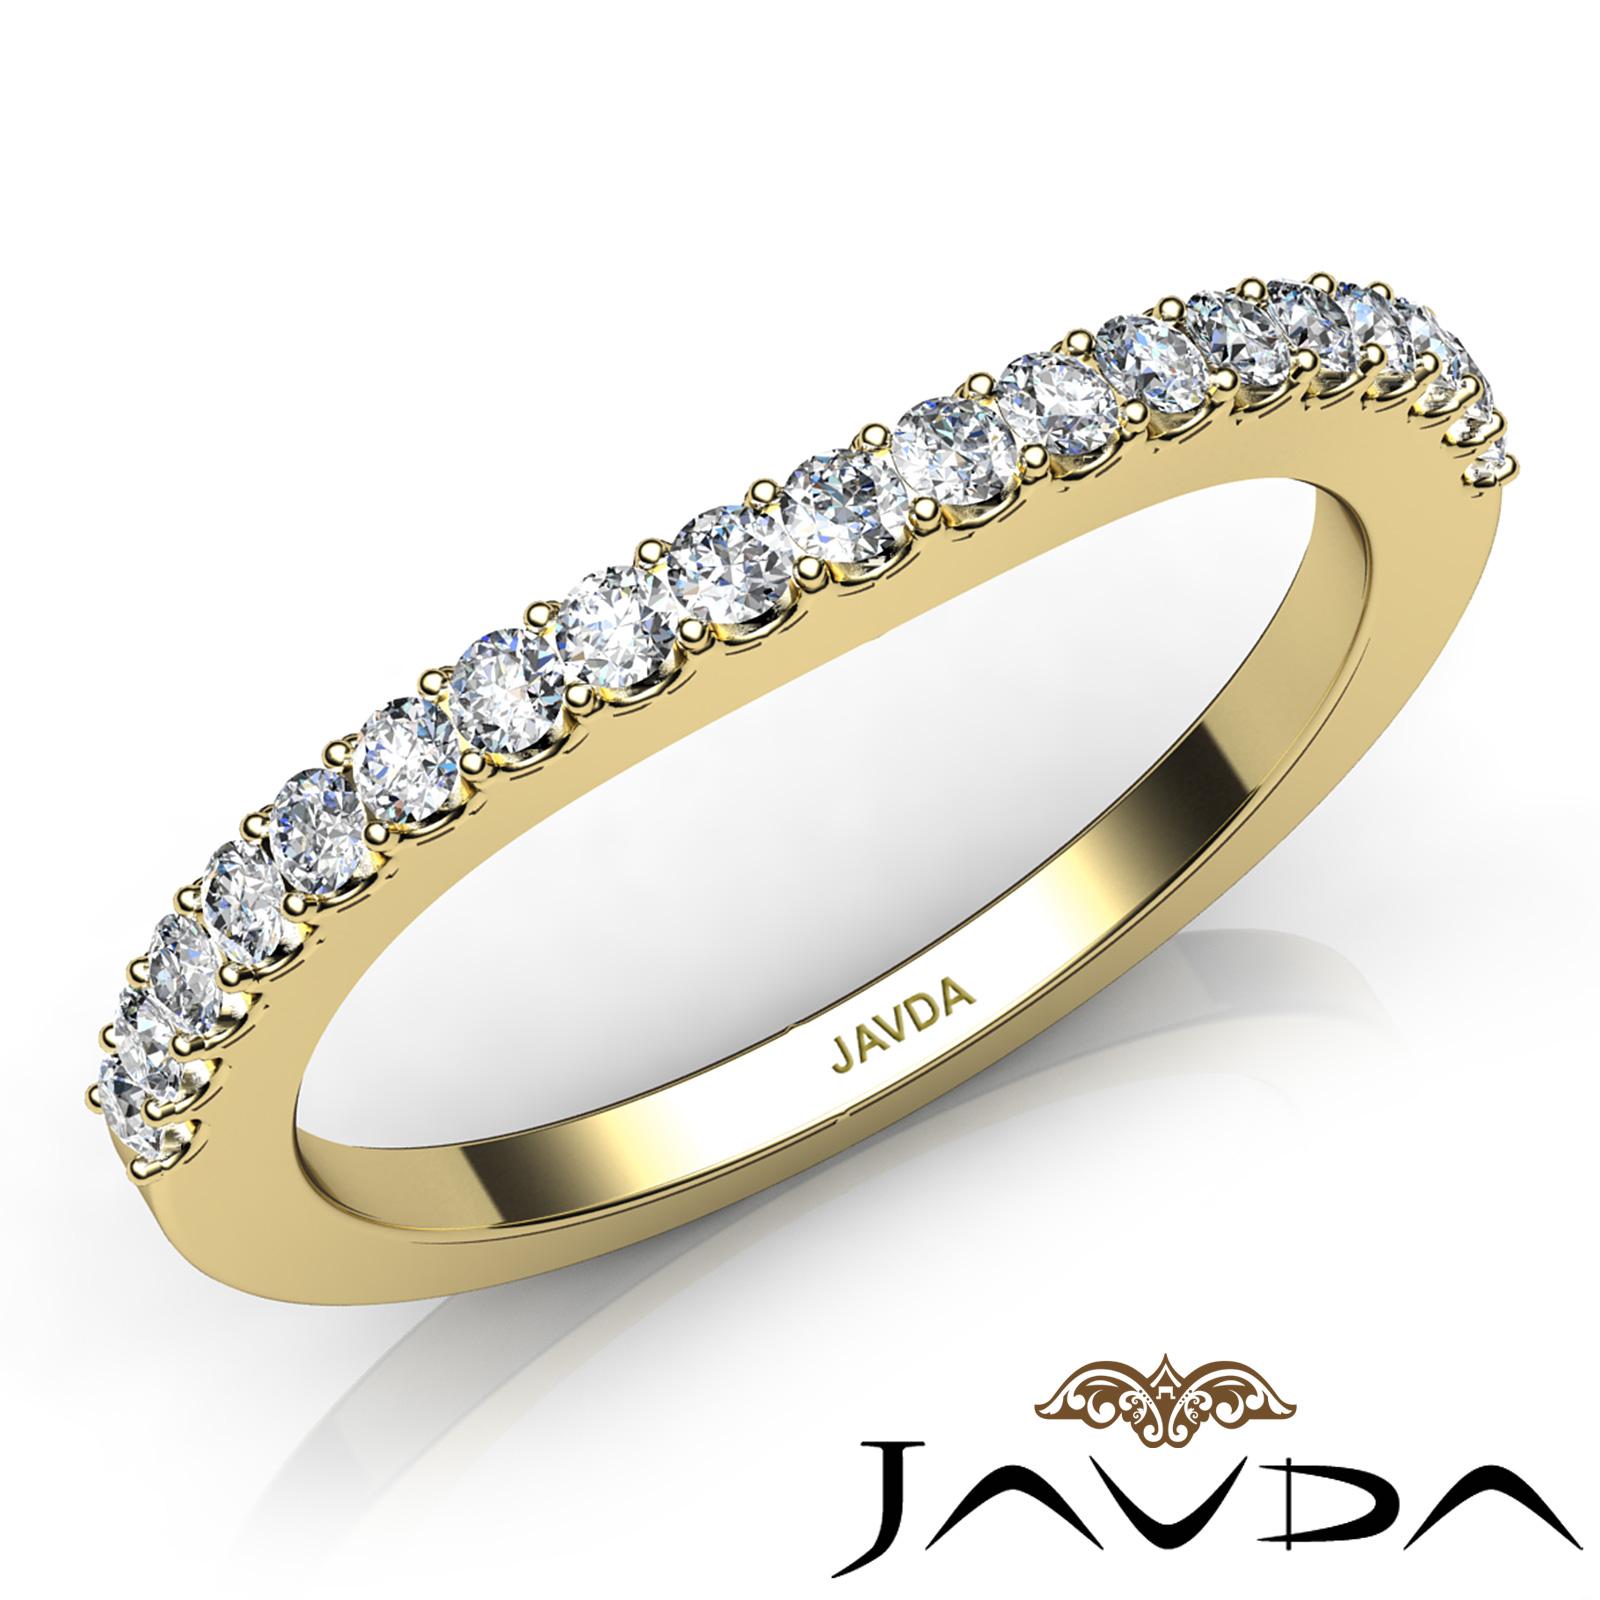 9mm Wedding Band 1 4 Ct Tw Black Diamonds Stainless Steel: Prong Diamond Women's Wedding Band Matching Set 1.9mm Ring